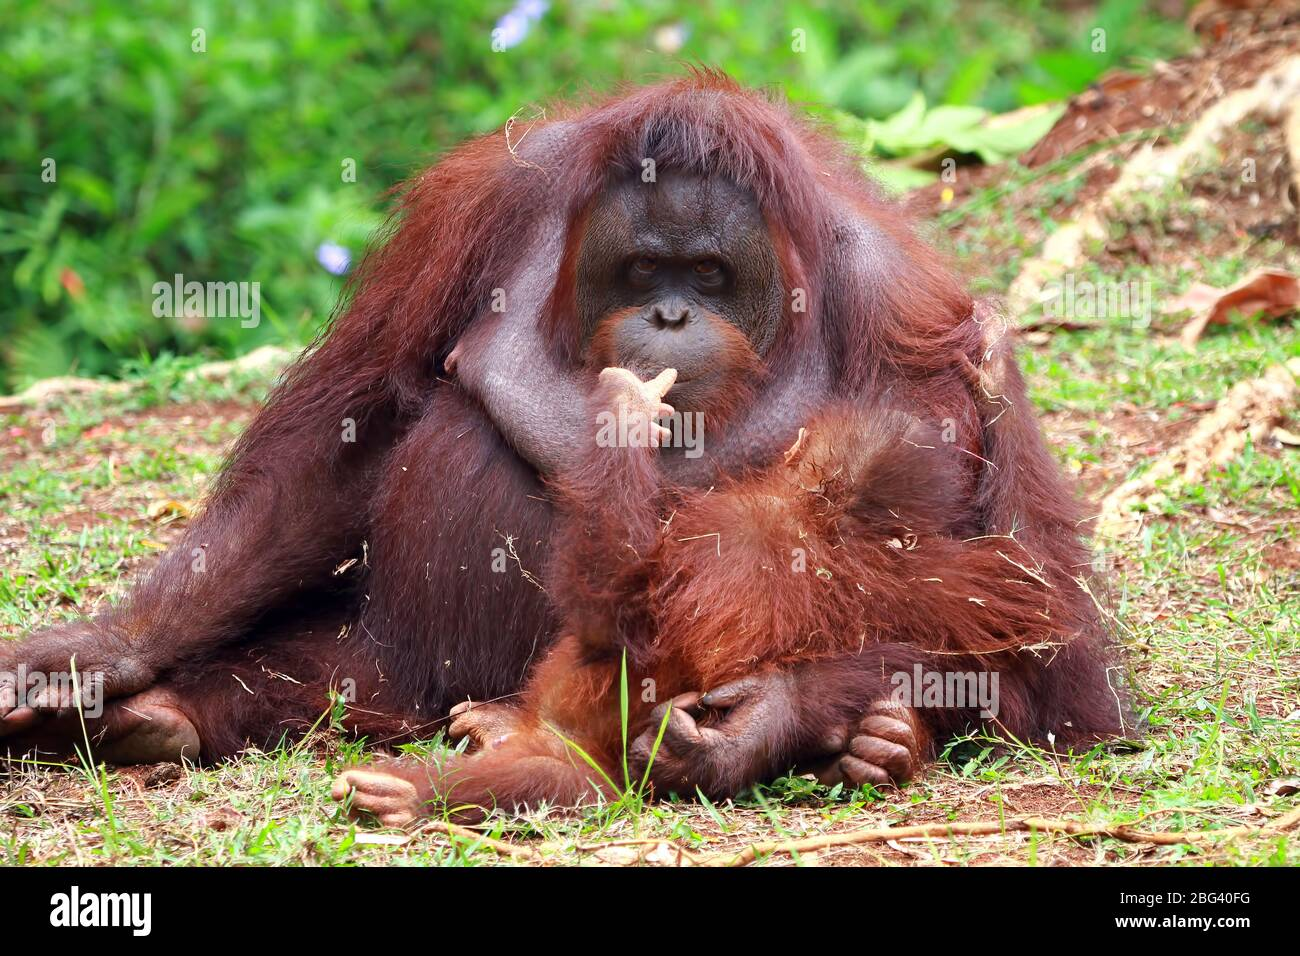 Orangután hembra con su bebé, Borneo, Indonesia Foto de stock